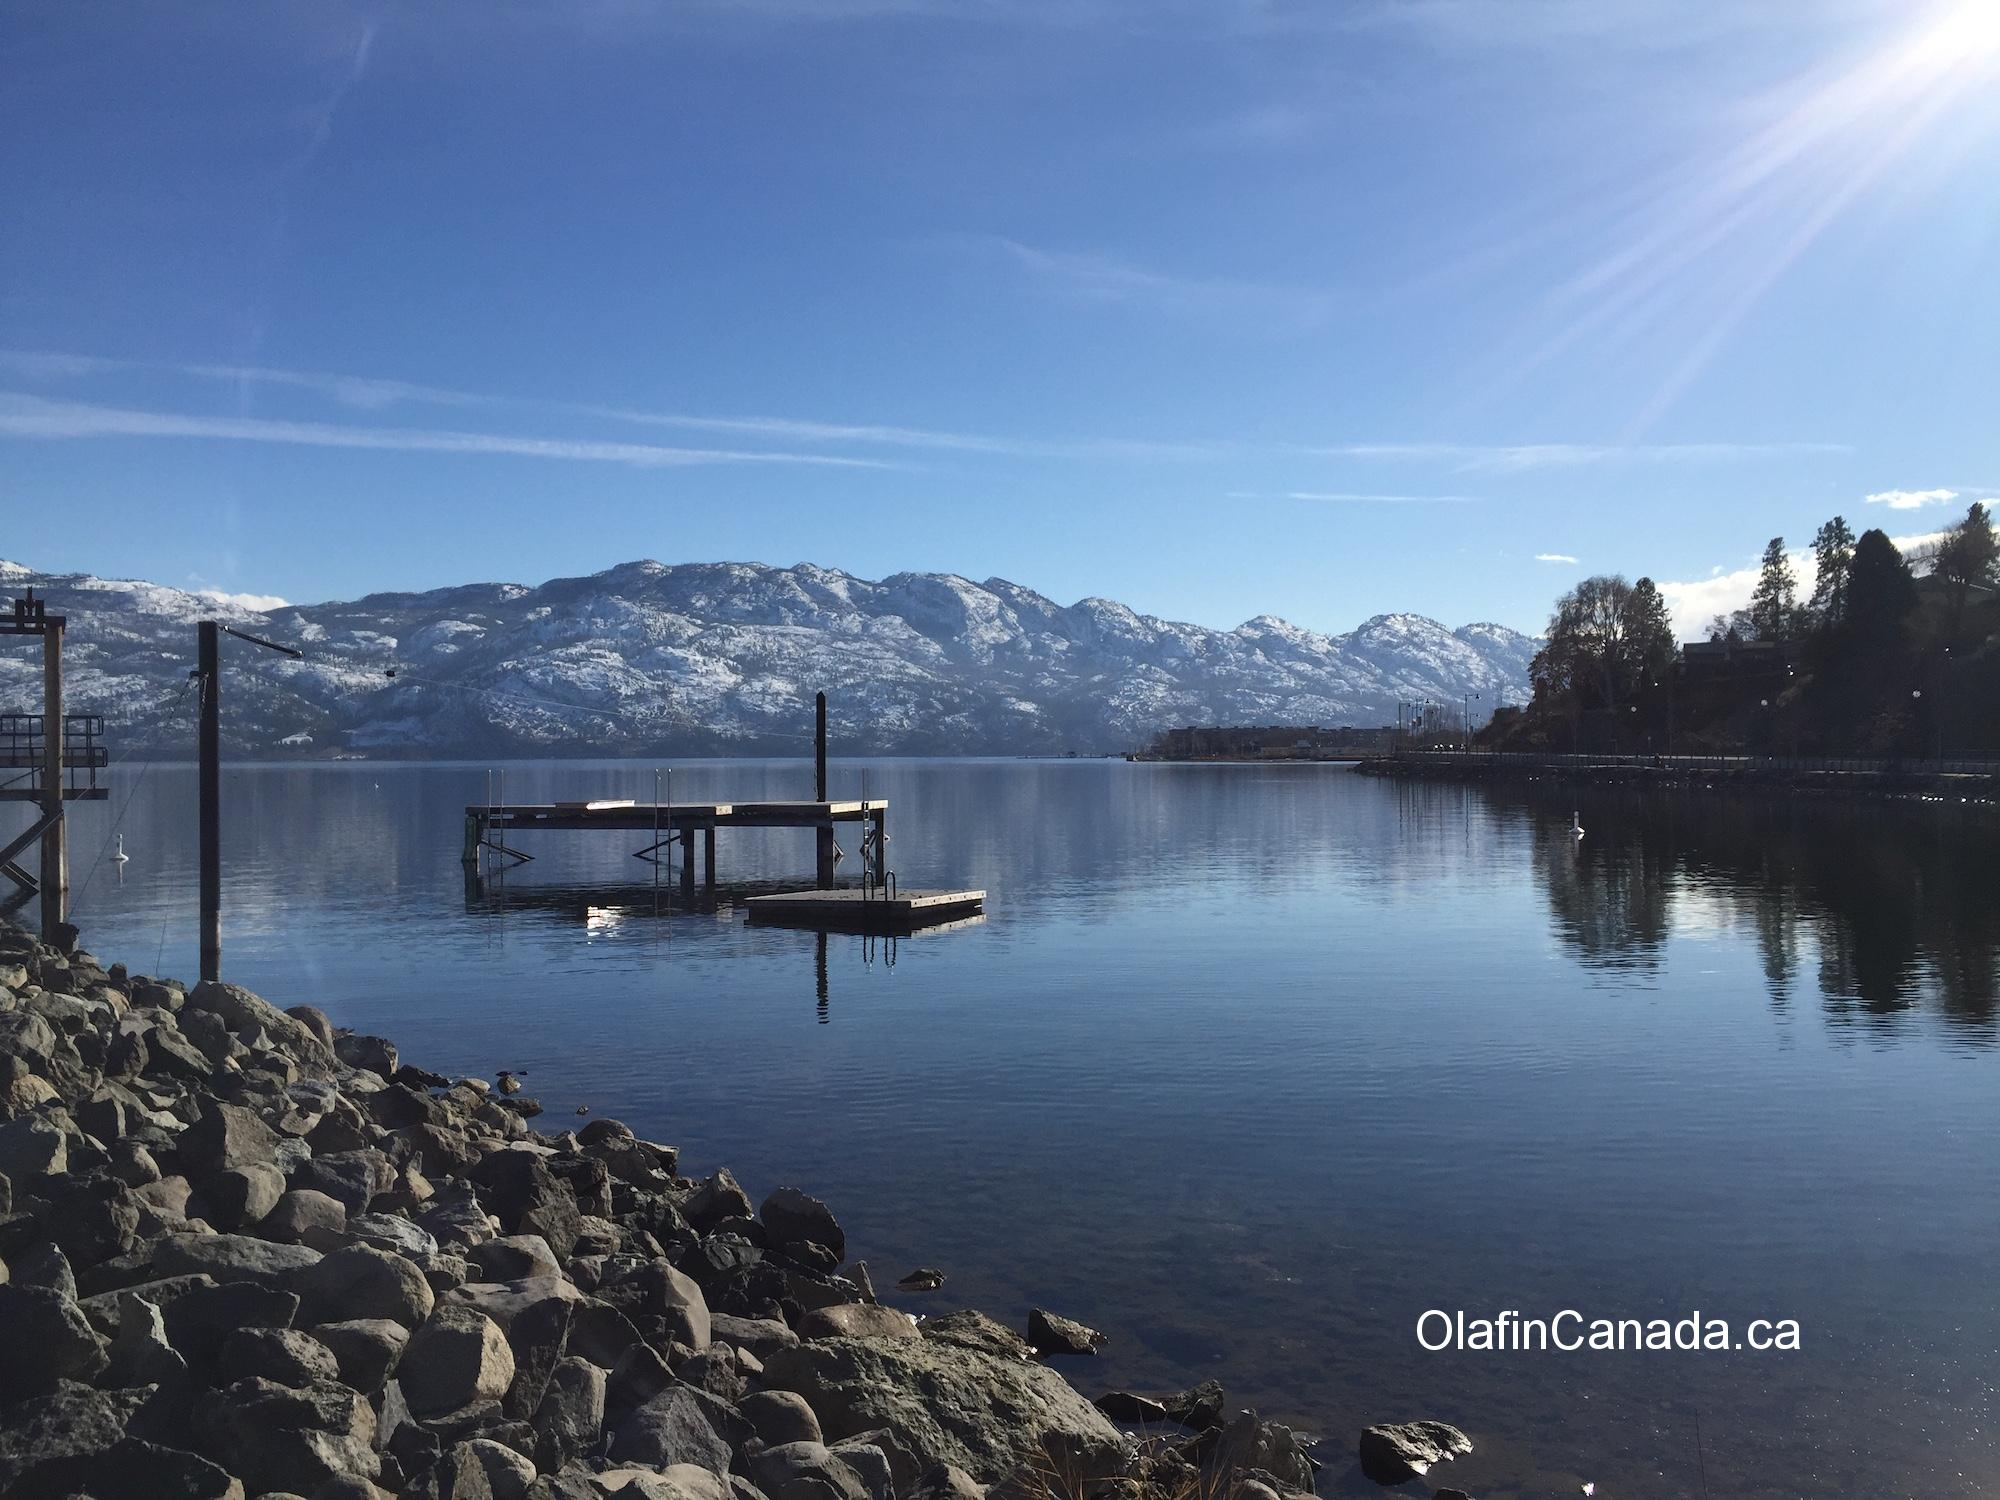 Okanagan Lake in West Kelowna #olafincanada #britishcolumbia #discoverbc #okanaganlake #westkelowna #sunshine